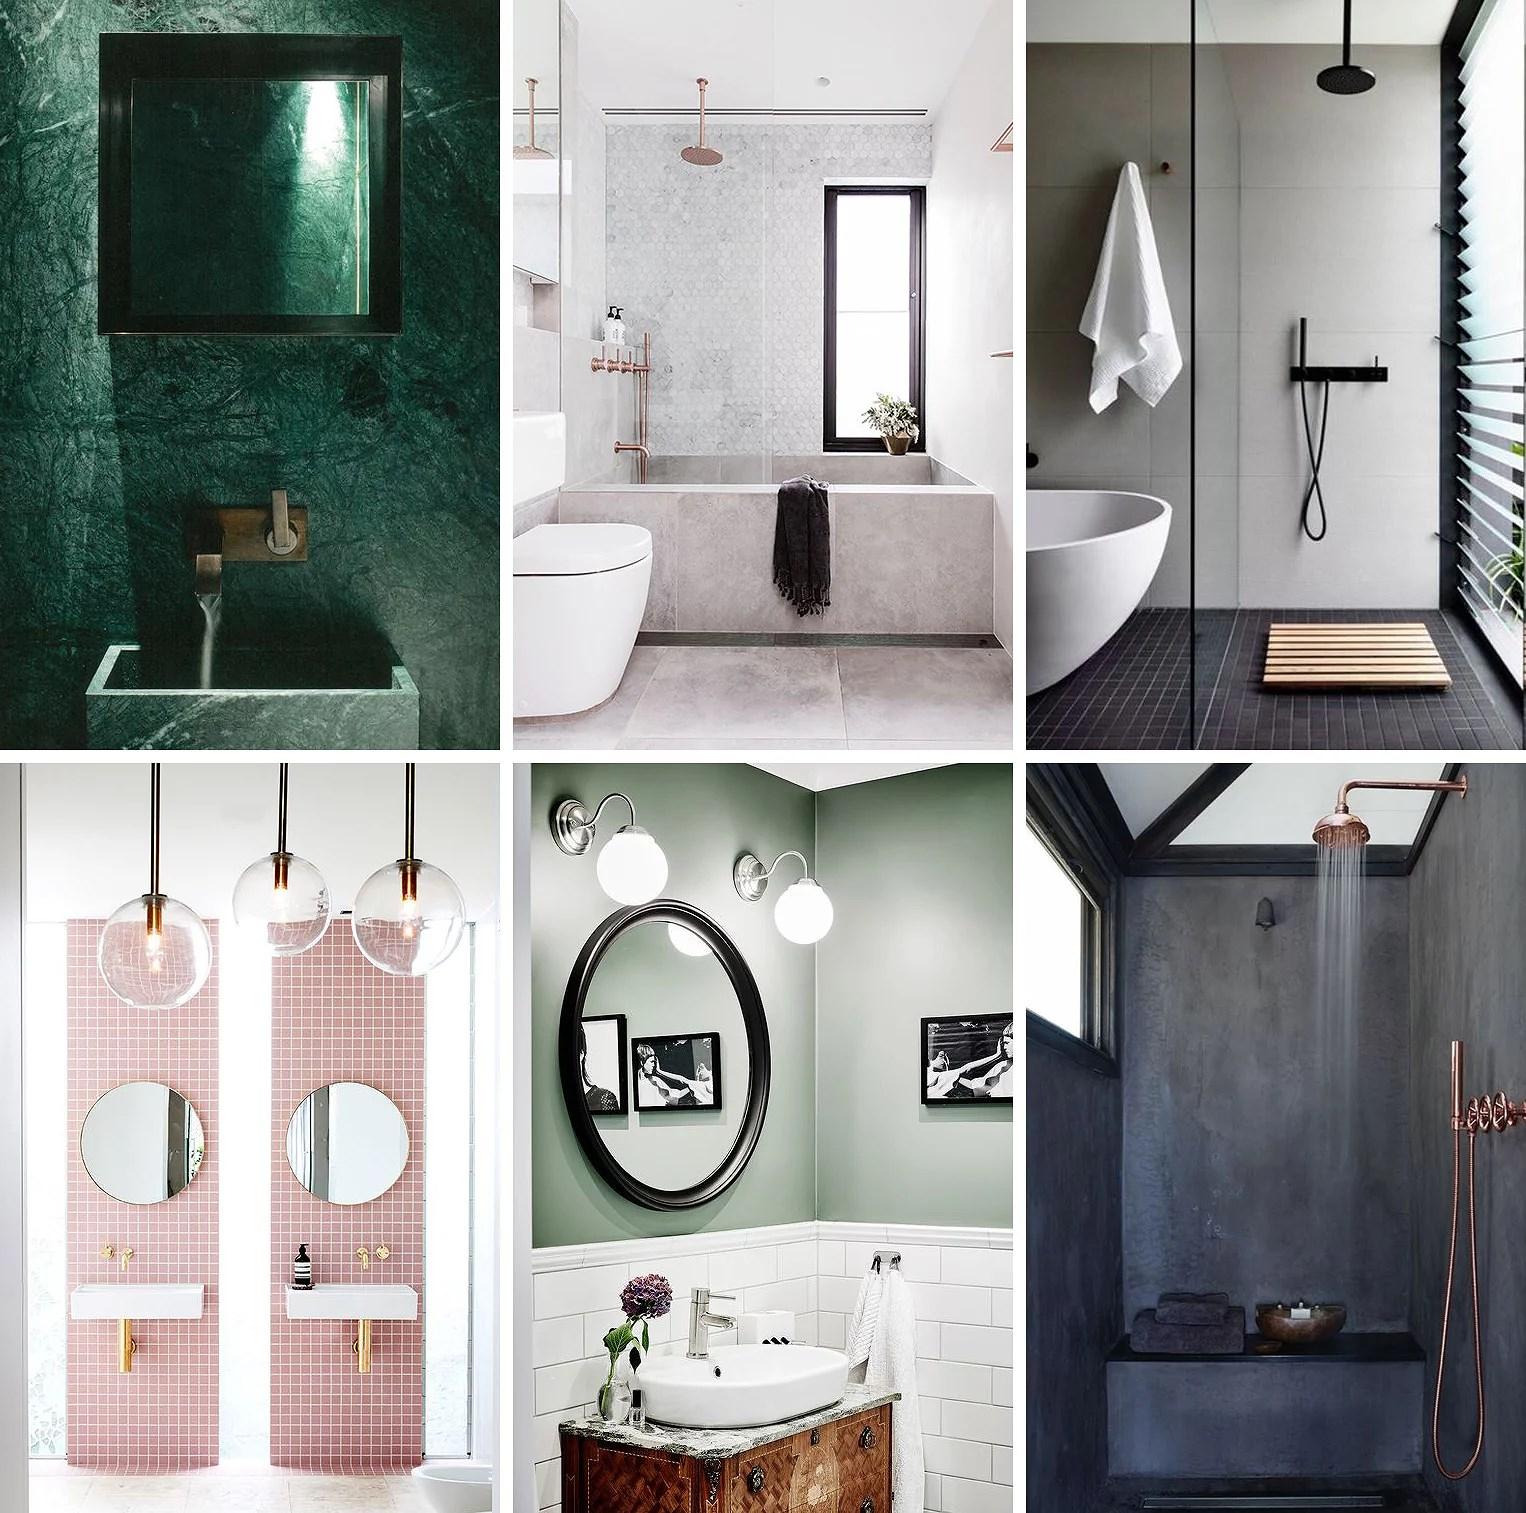 INSPIRATION: BATH ROOM